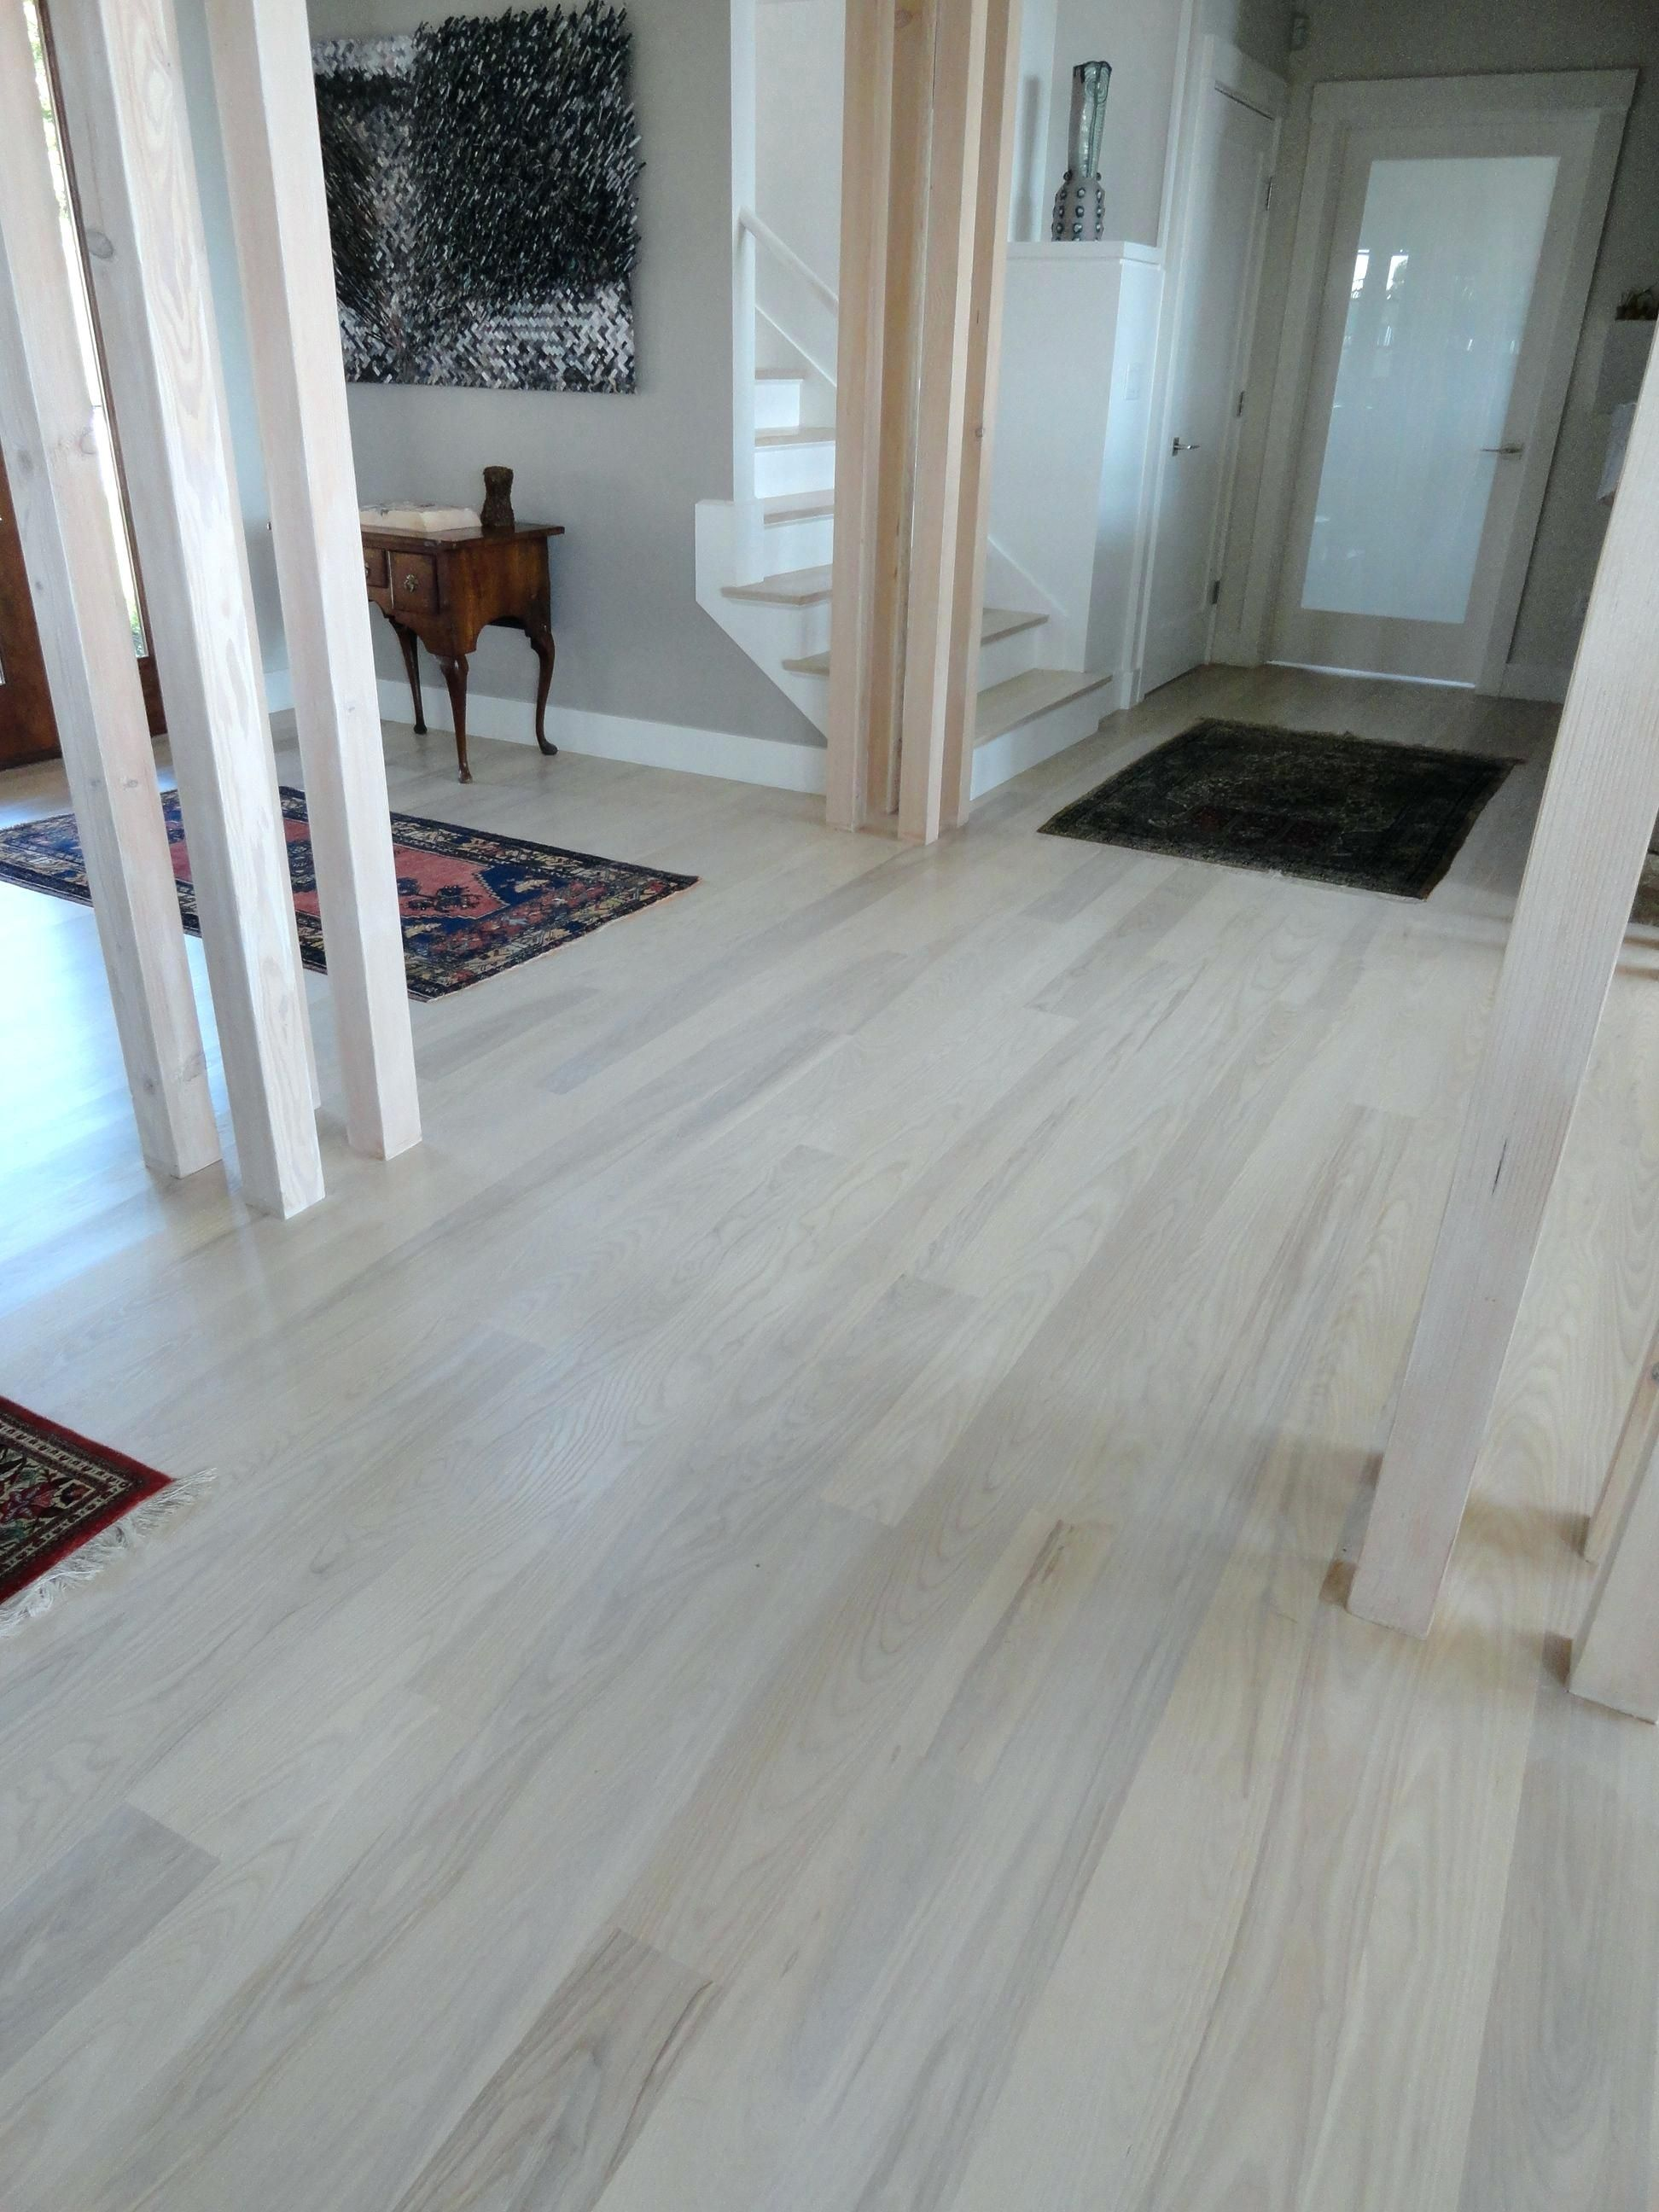 Bleach Laminate Wood Floors So You Are Attempting To Choose What Kind Of Fl Wood Floors Wide Plank Waterproof Laminate Flooring Whitewashed Hardwood Flooring